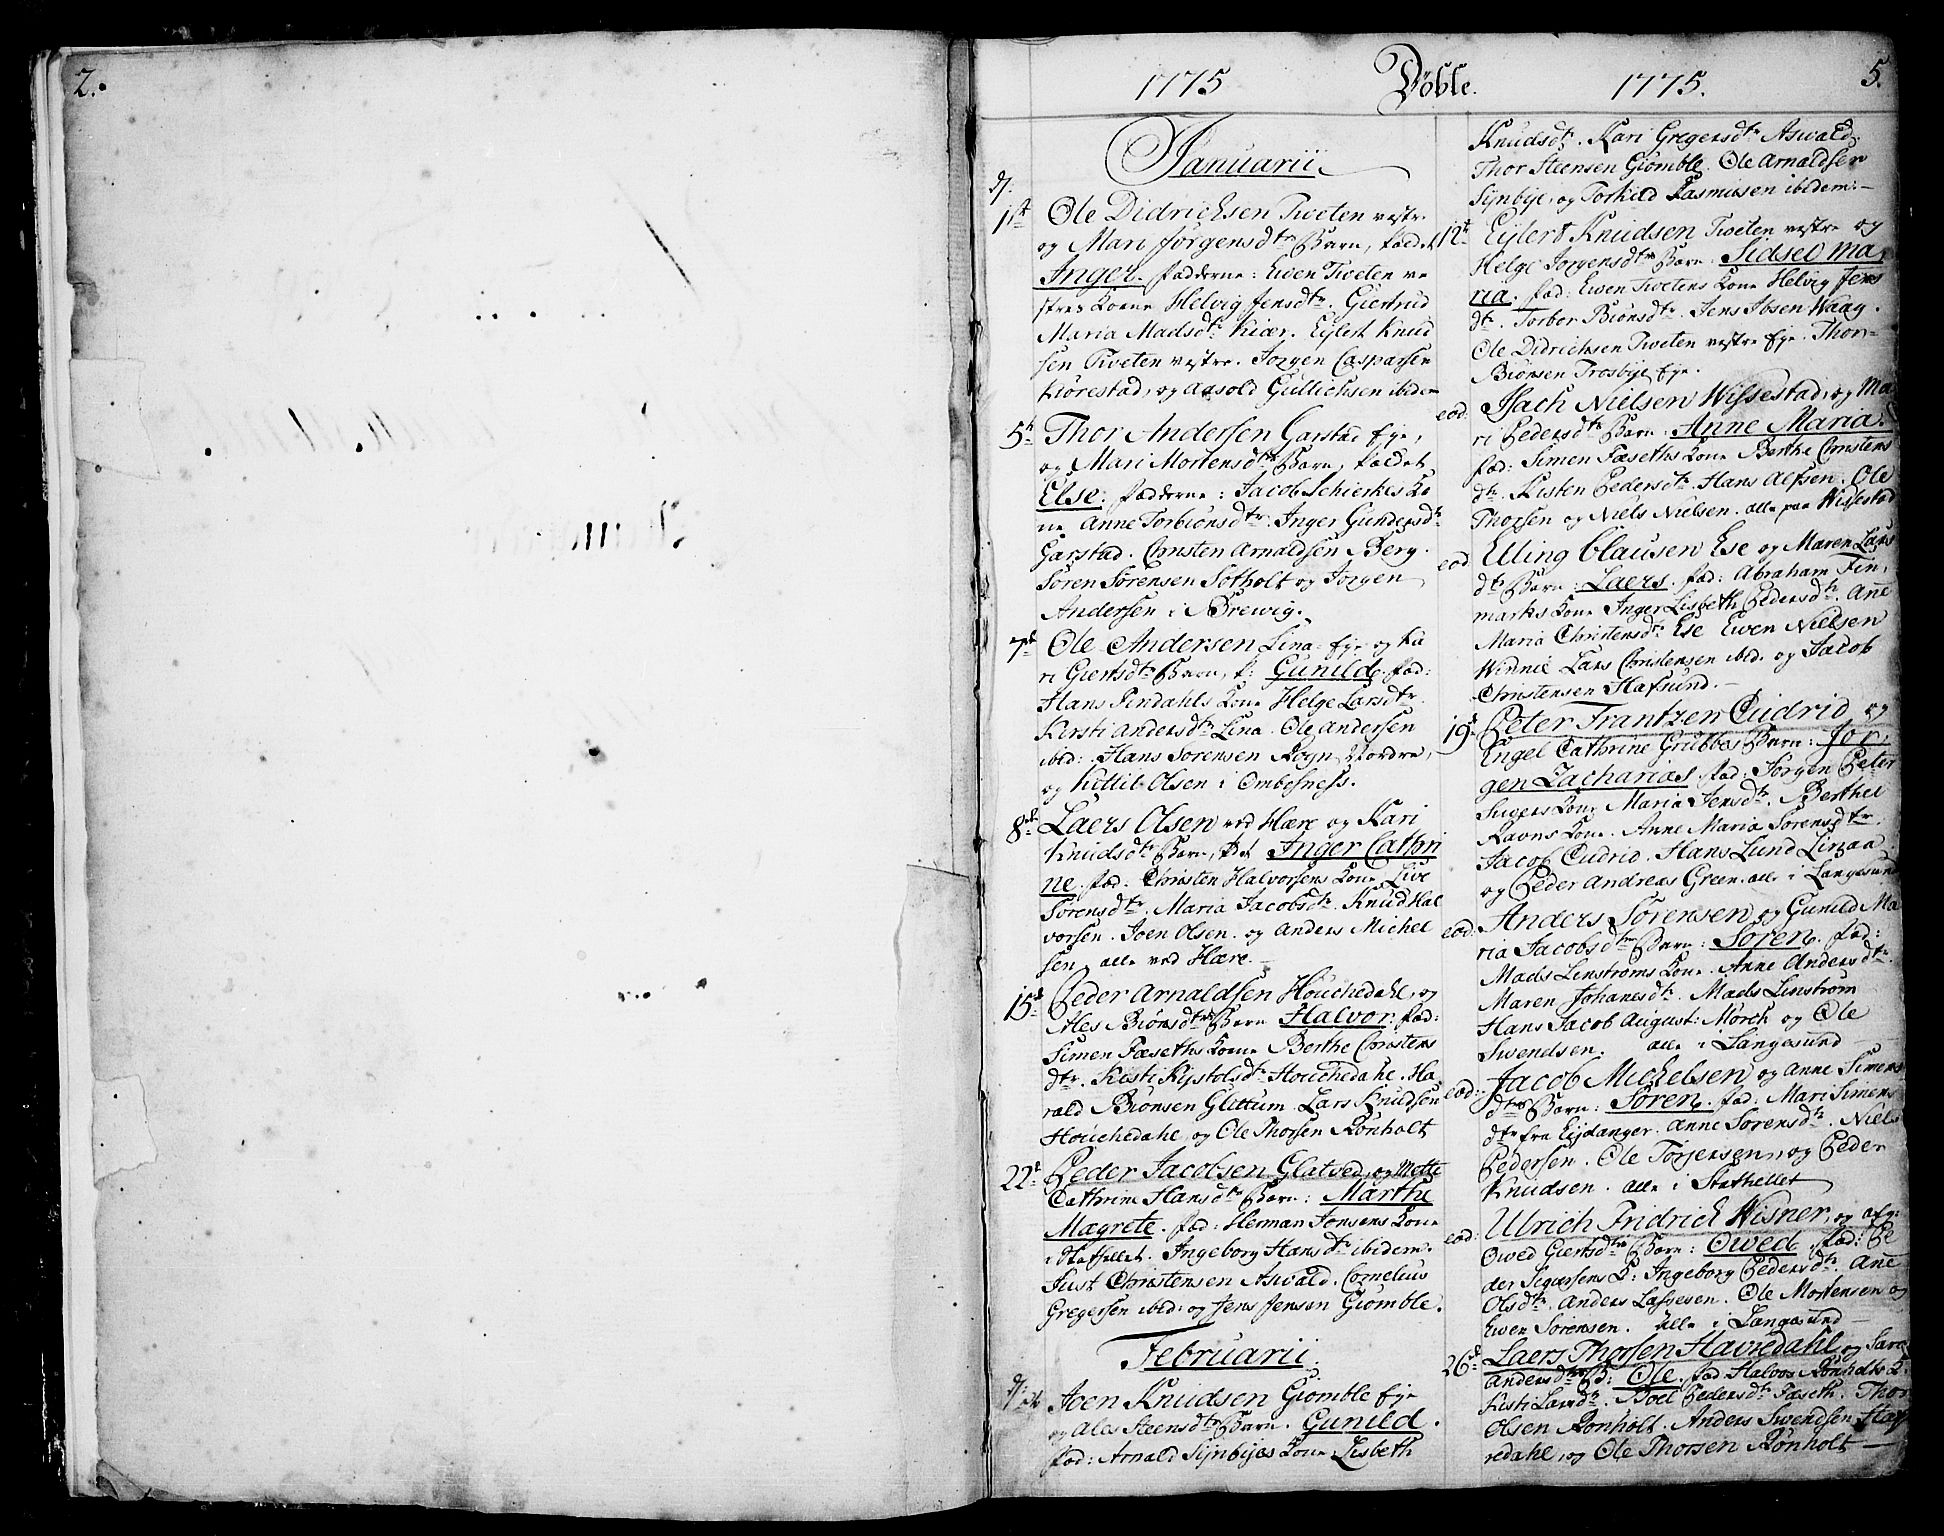 SAKO, Bamble kirkebøker, F/Fa/L0002: Ministerialbok nr. I 2, 1775-1814, s. 4-5